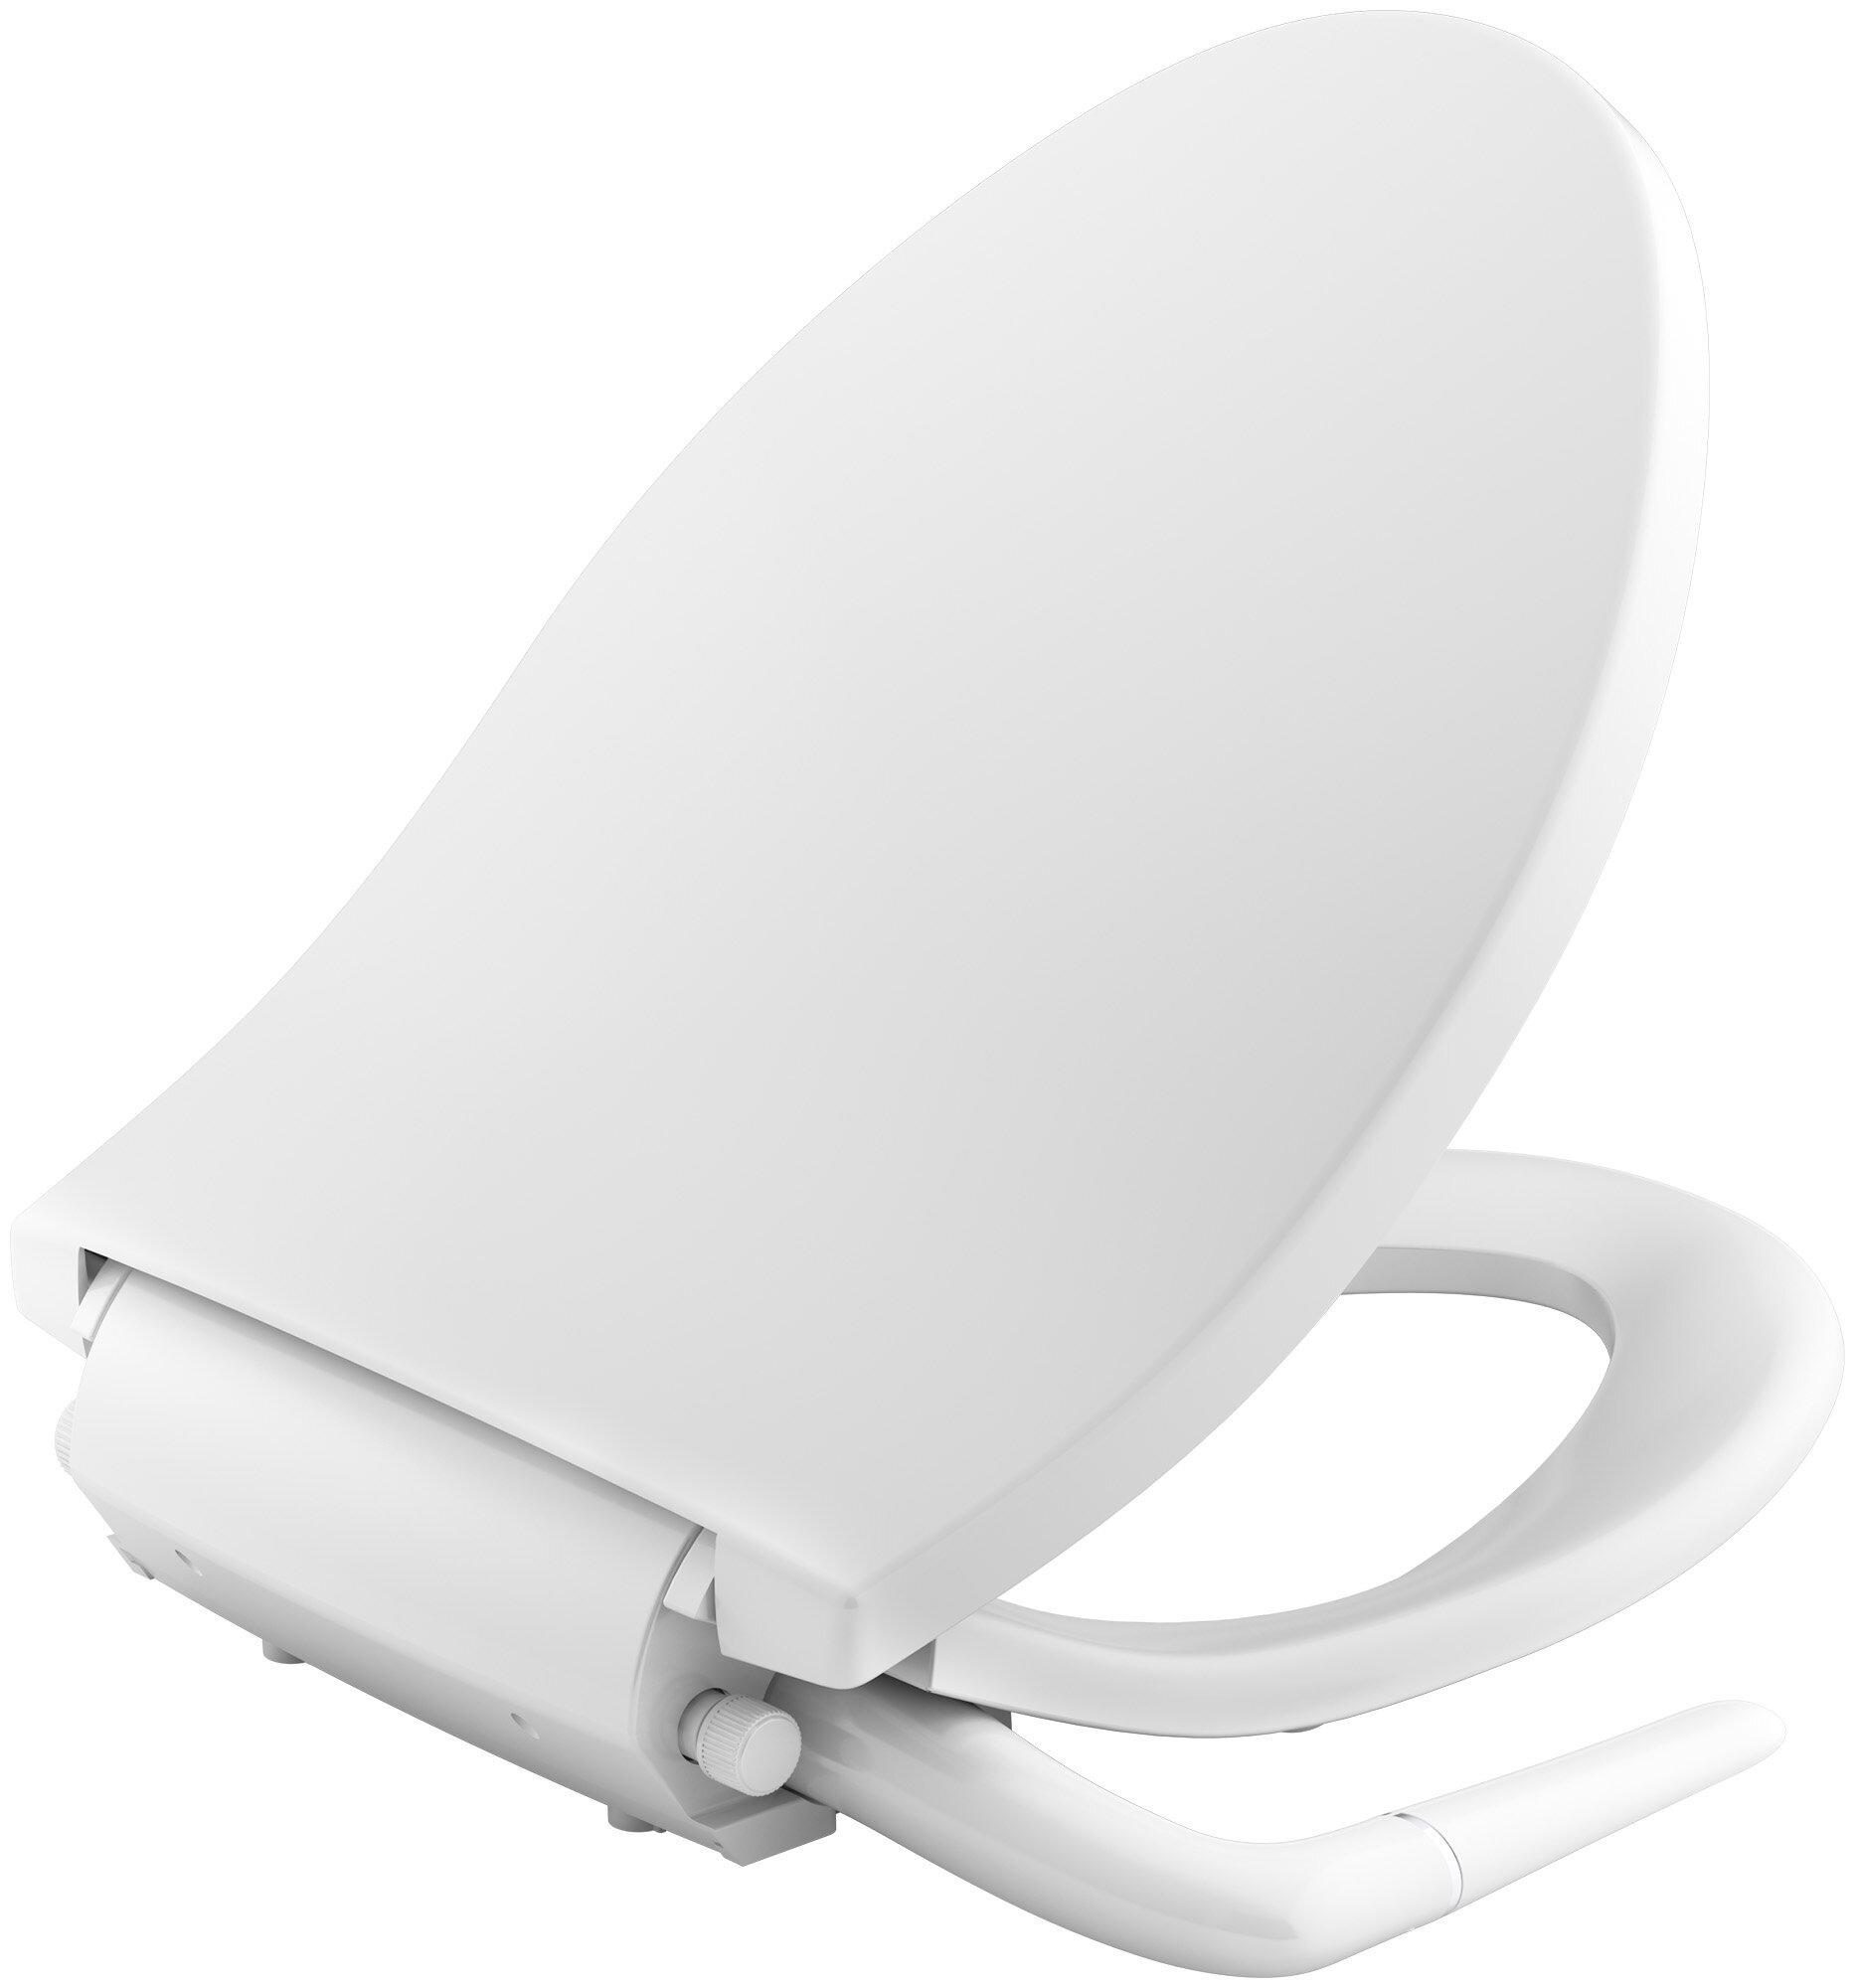 K-5724-0 Kohler Puretide Elongated Manual Bidet Seat & Reviews | Wayfair